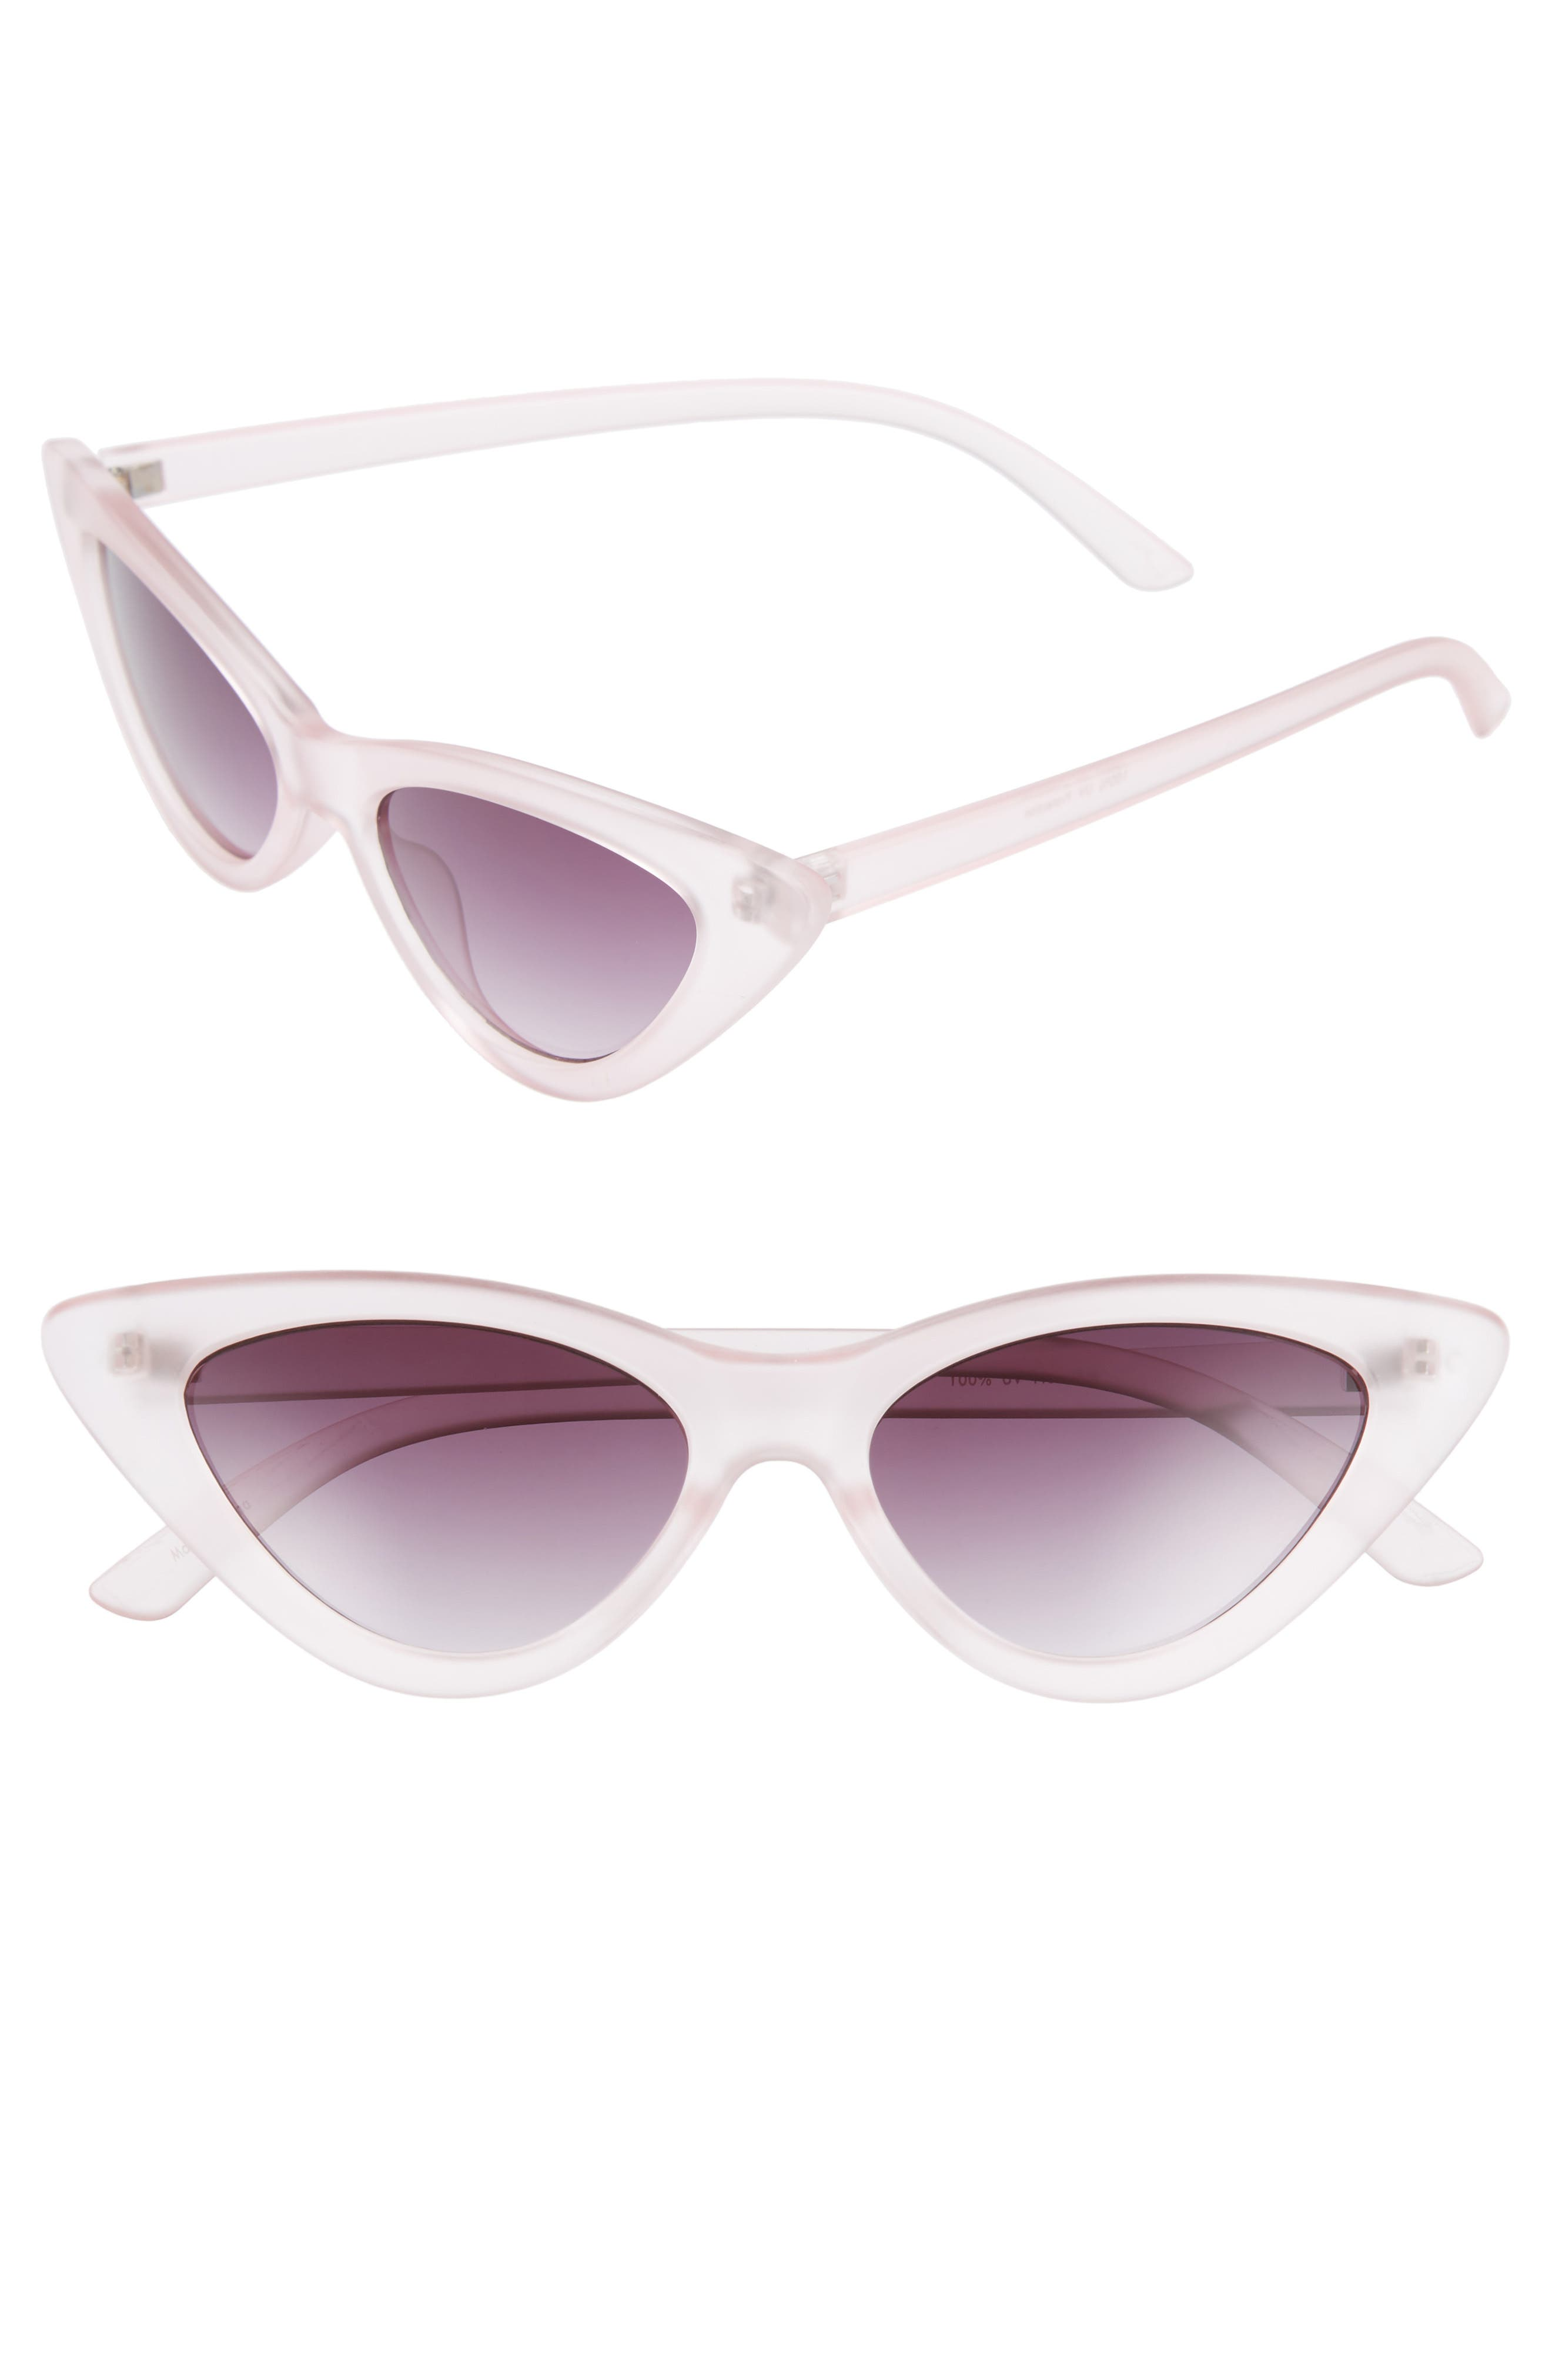 62mm Cat Eye Sunglasses,                             Main thumbnail 3, color,